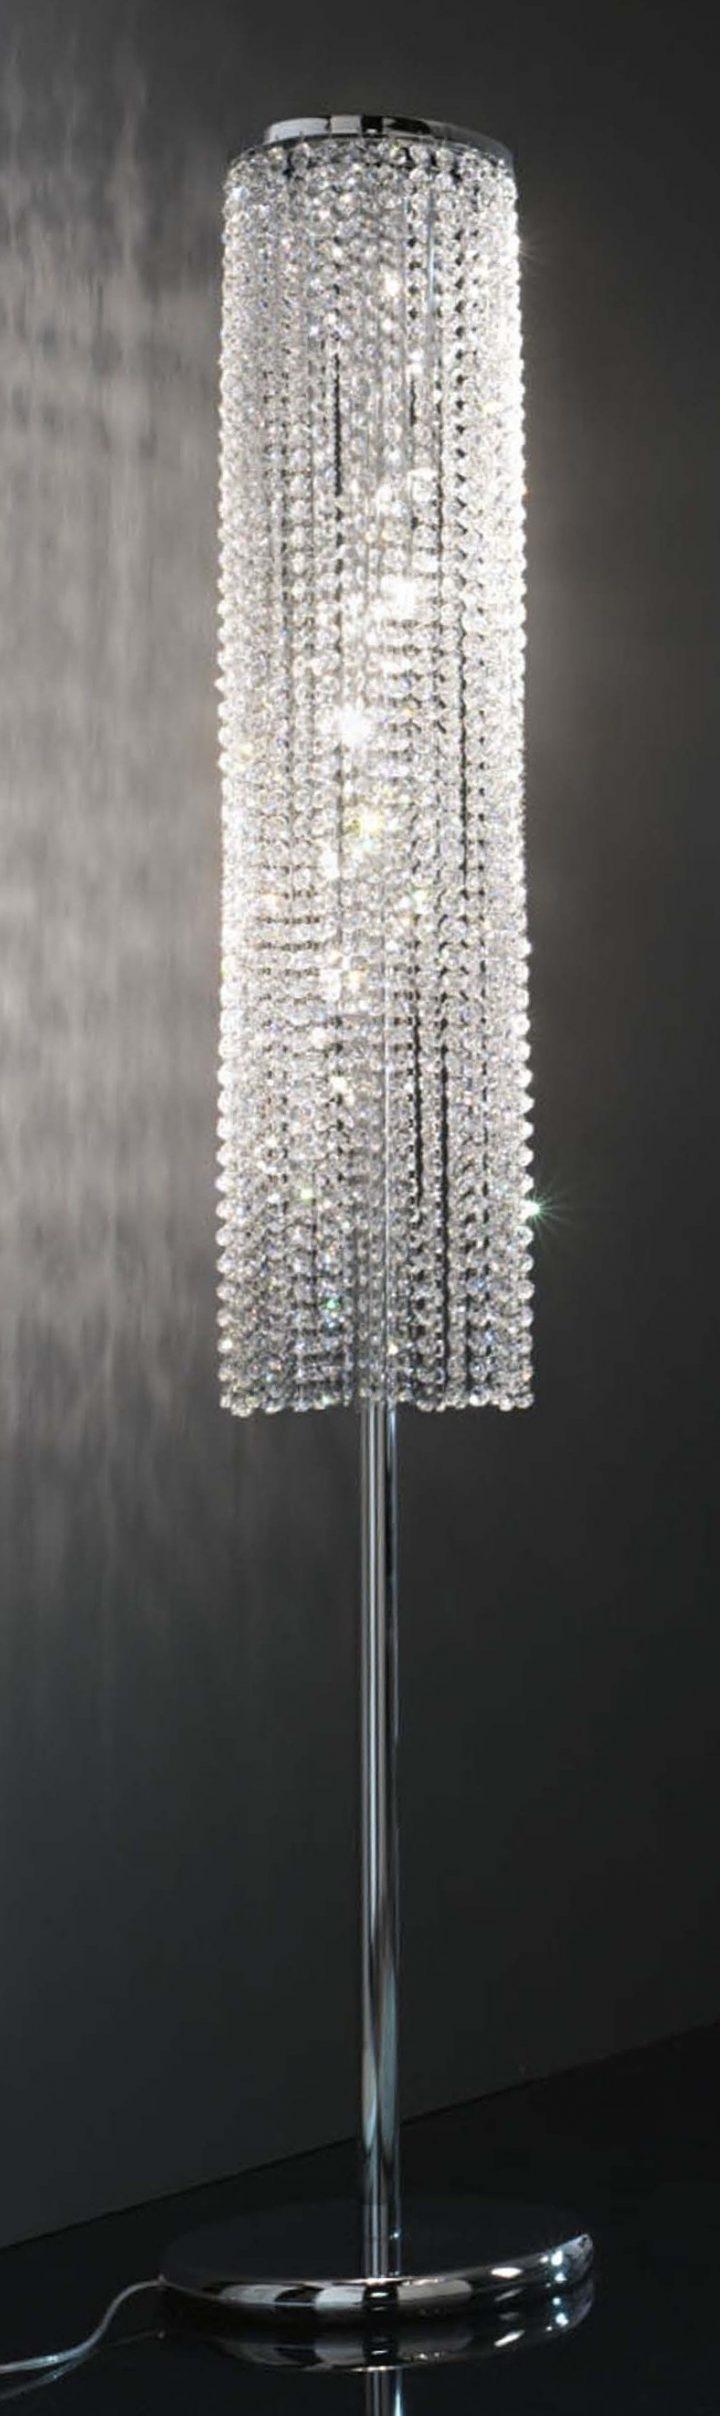 Trendy Crystal Chandelier Standing Lamps With Regard To Chandeliers Design : Magnificent Floor Lamp Crystal Chandelier Turn (View 5 of 15)